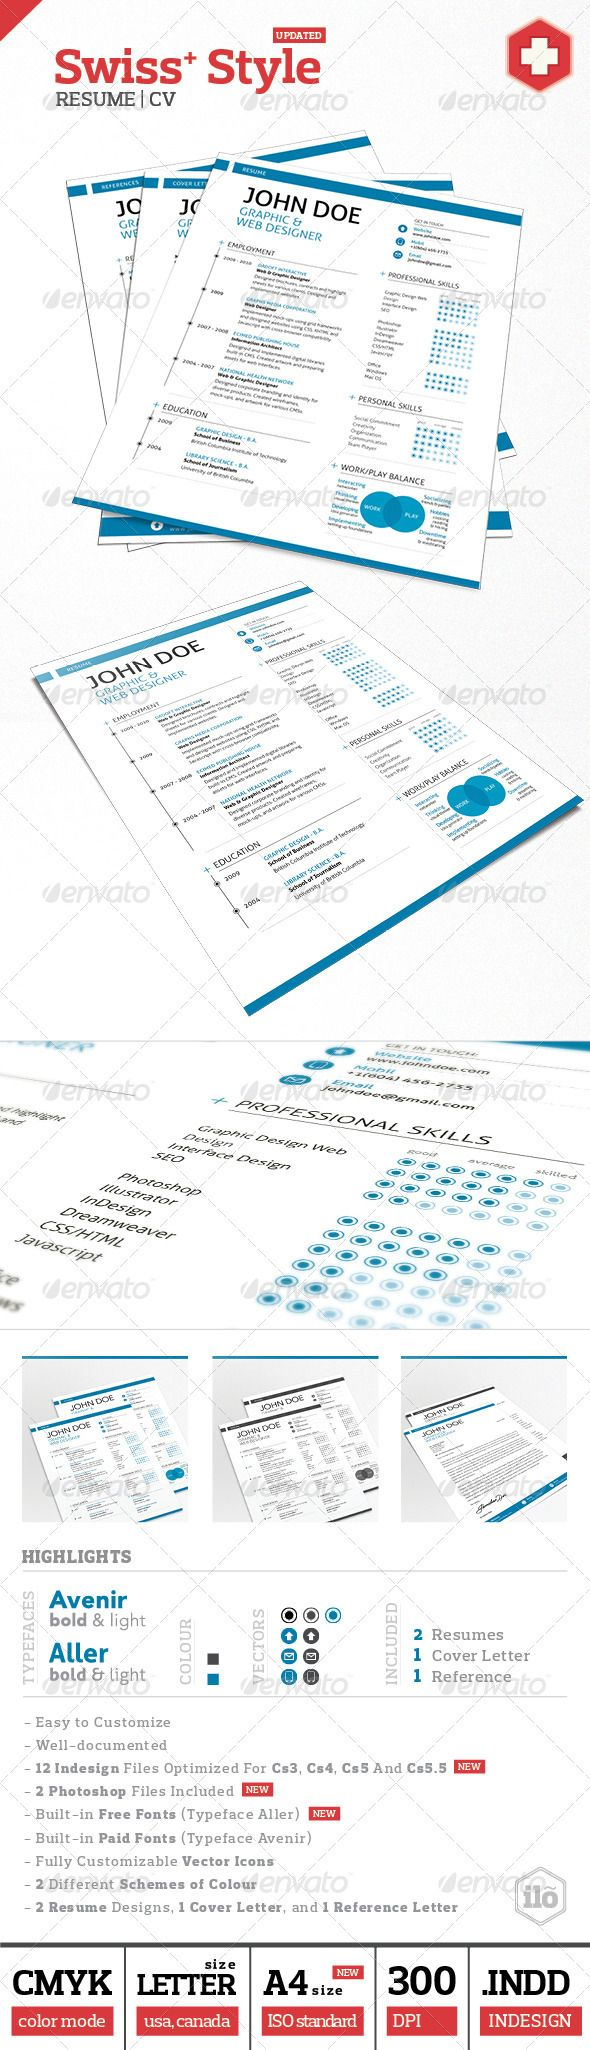 3 piece swiss style resume set resume pinterest swiss style